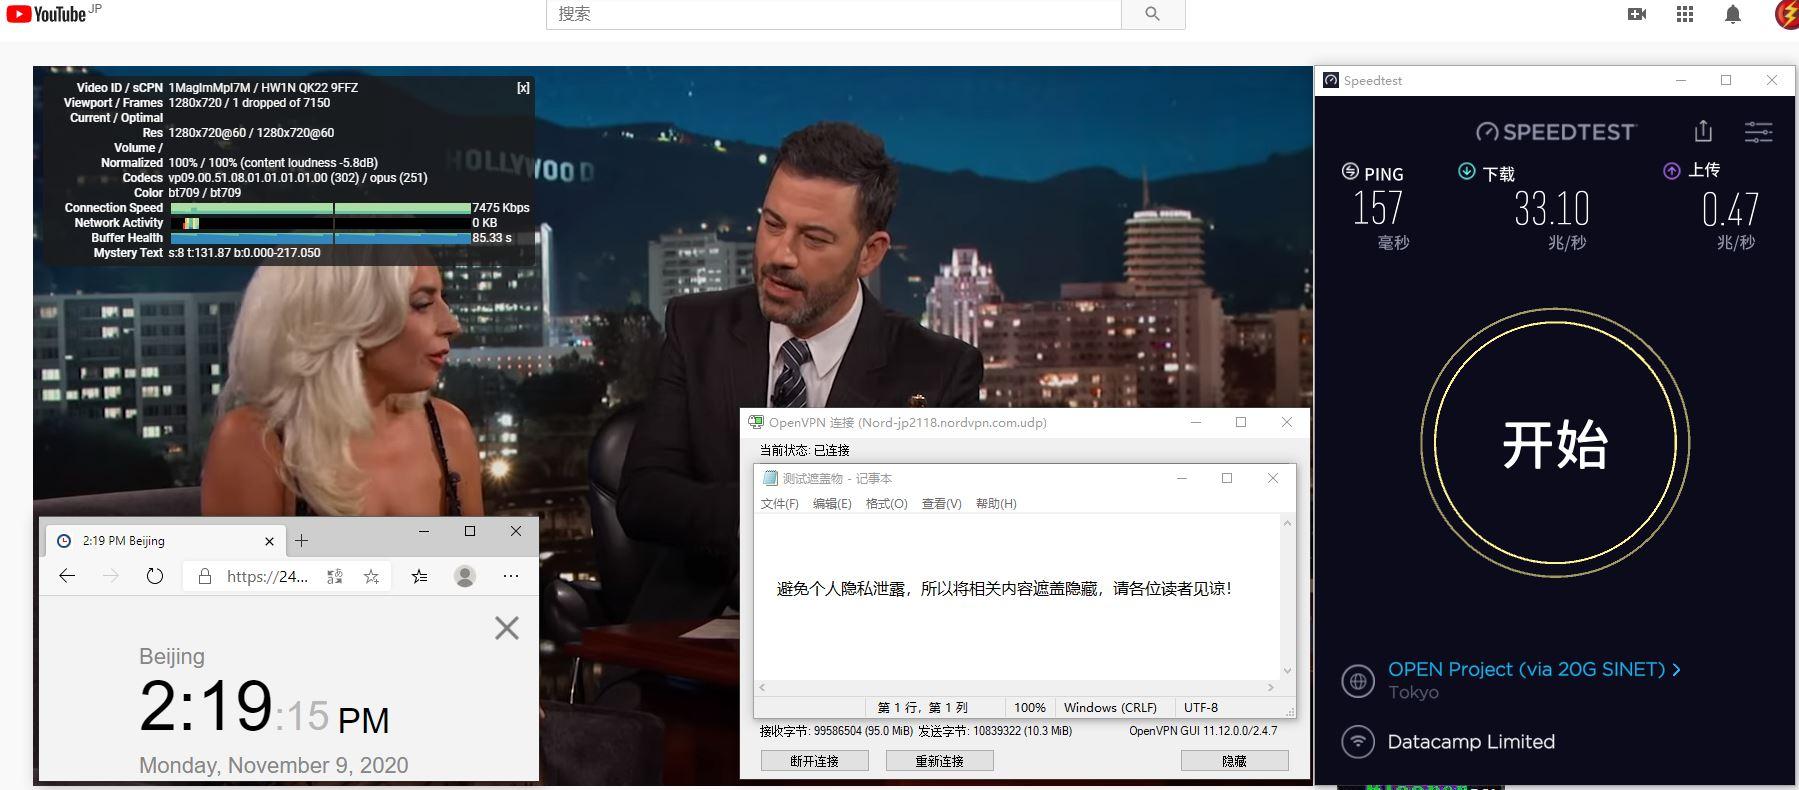 Windows10 NordVPN OpenVPN Gui jp2118 服务器 中国VPN 翻墙 科学上网 测试 - 20201109